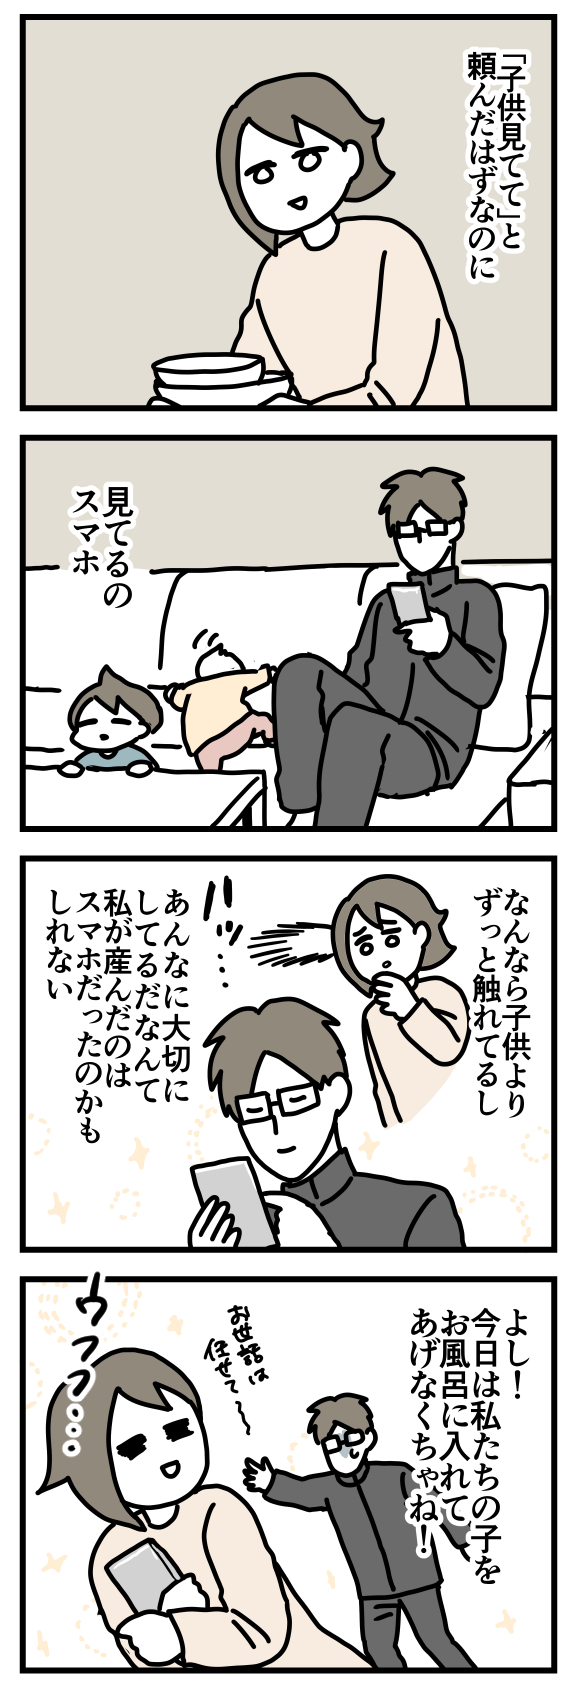 f:id:kanemotonomukuu:20171016113129j:plain